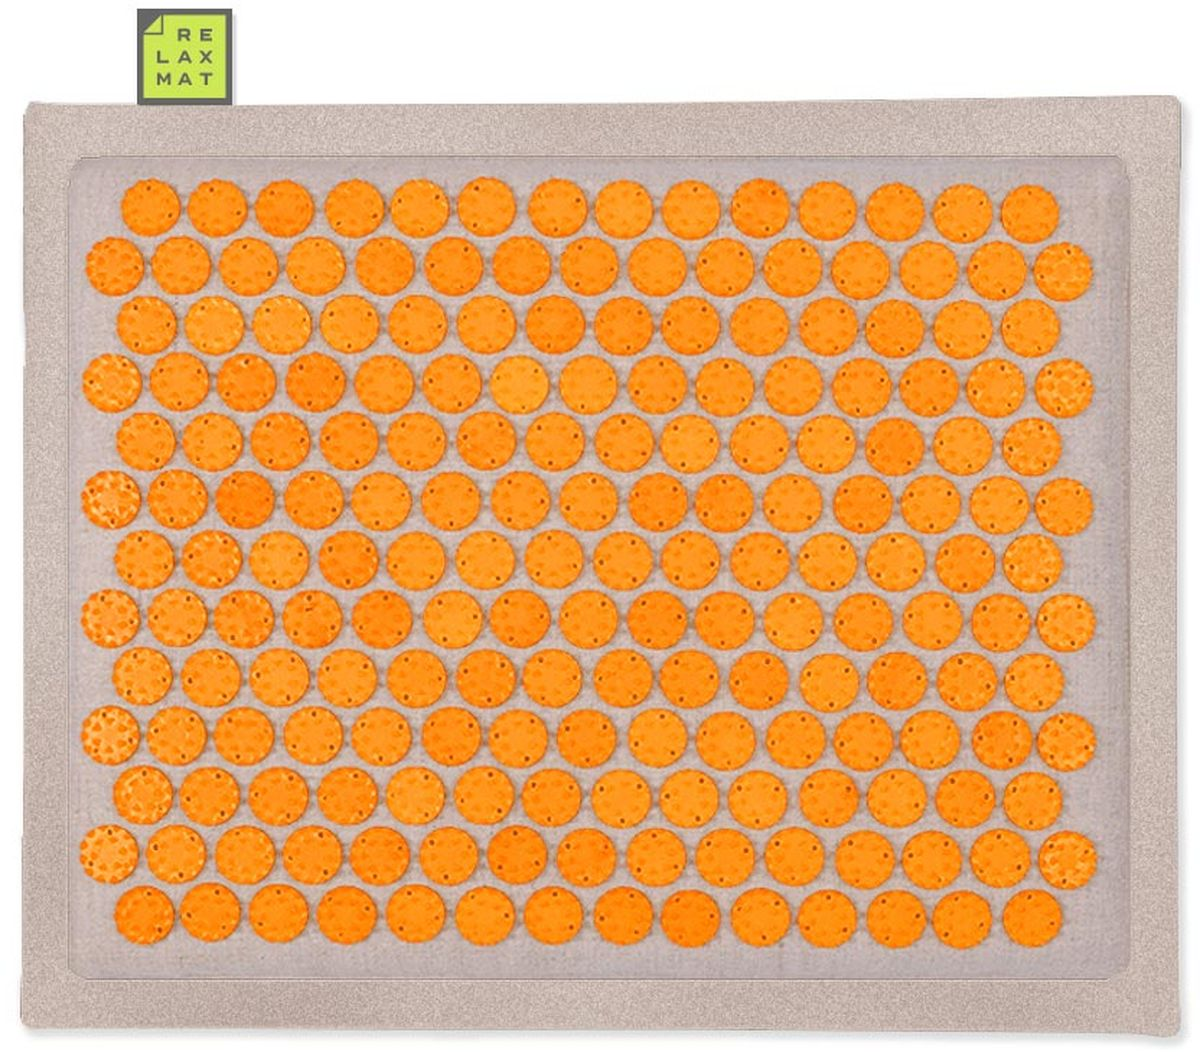 Relaxmat Массажный коврик, цвет: оранжевый, 40 х 30 см